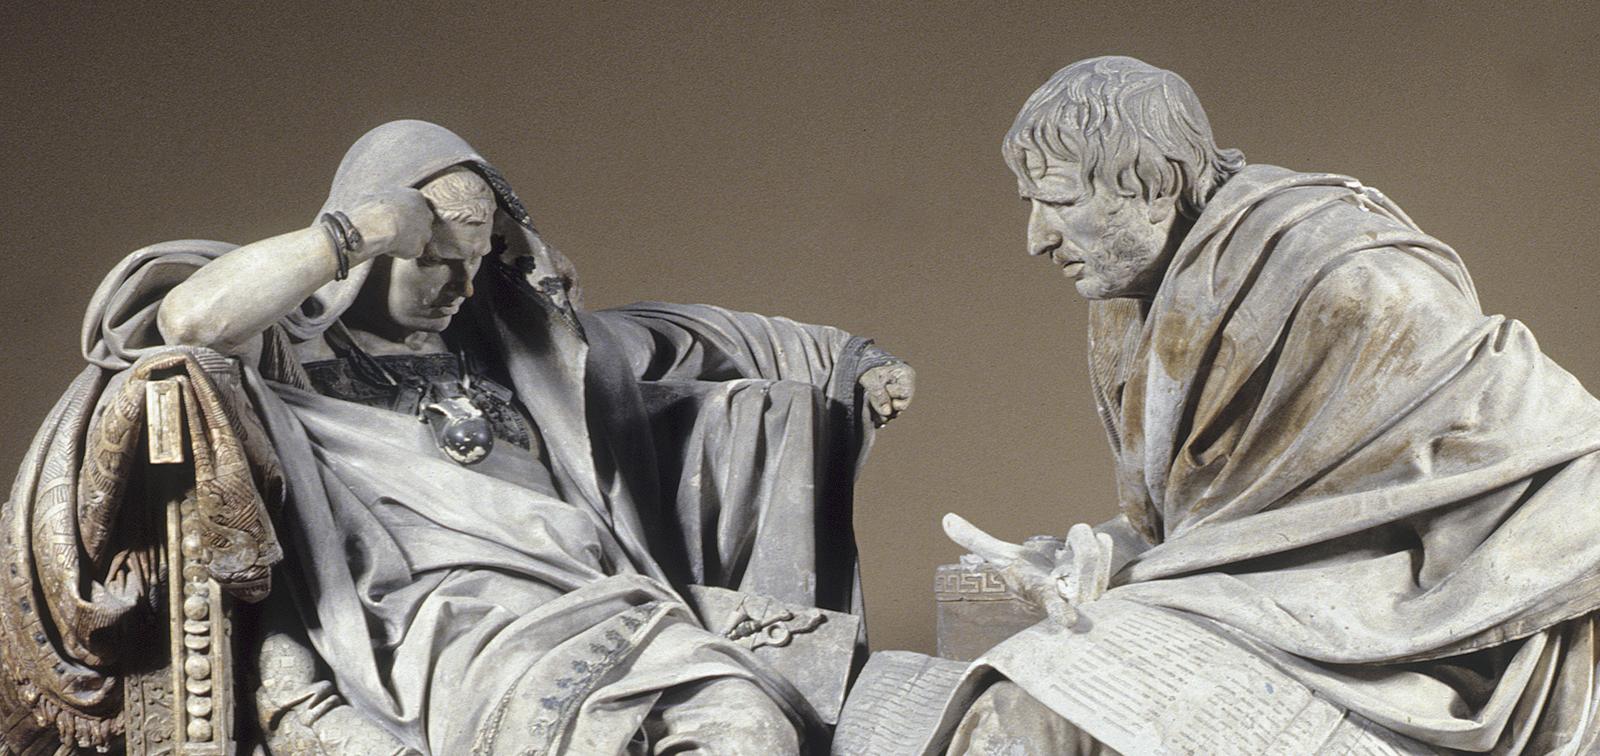 Temporary Installation: Nero and Seneca by Eduardo Barrón